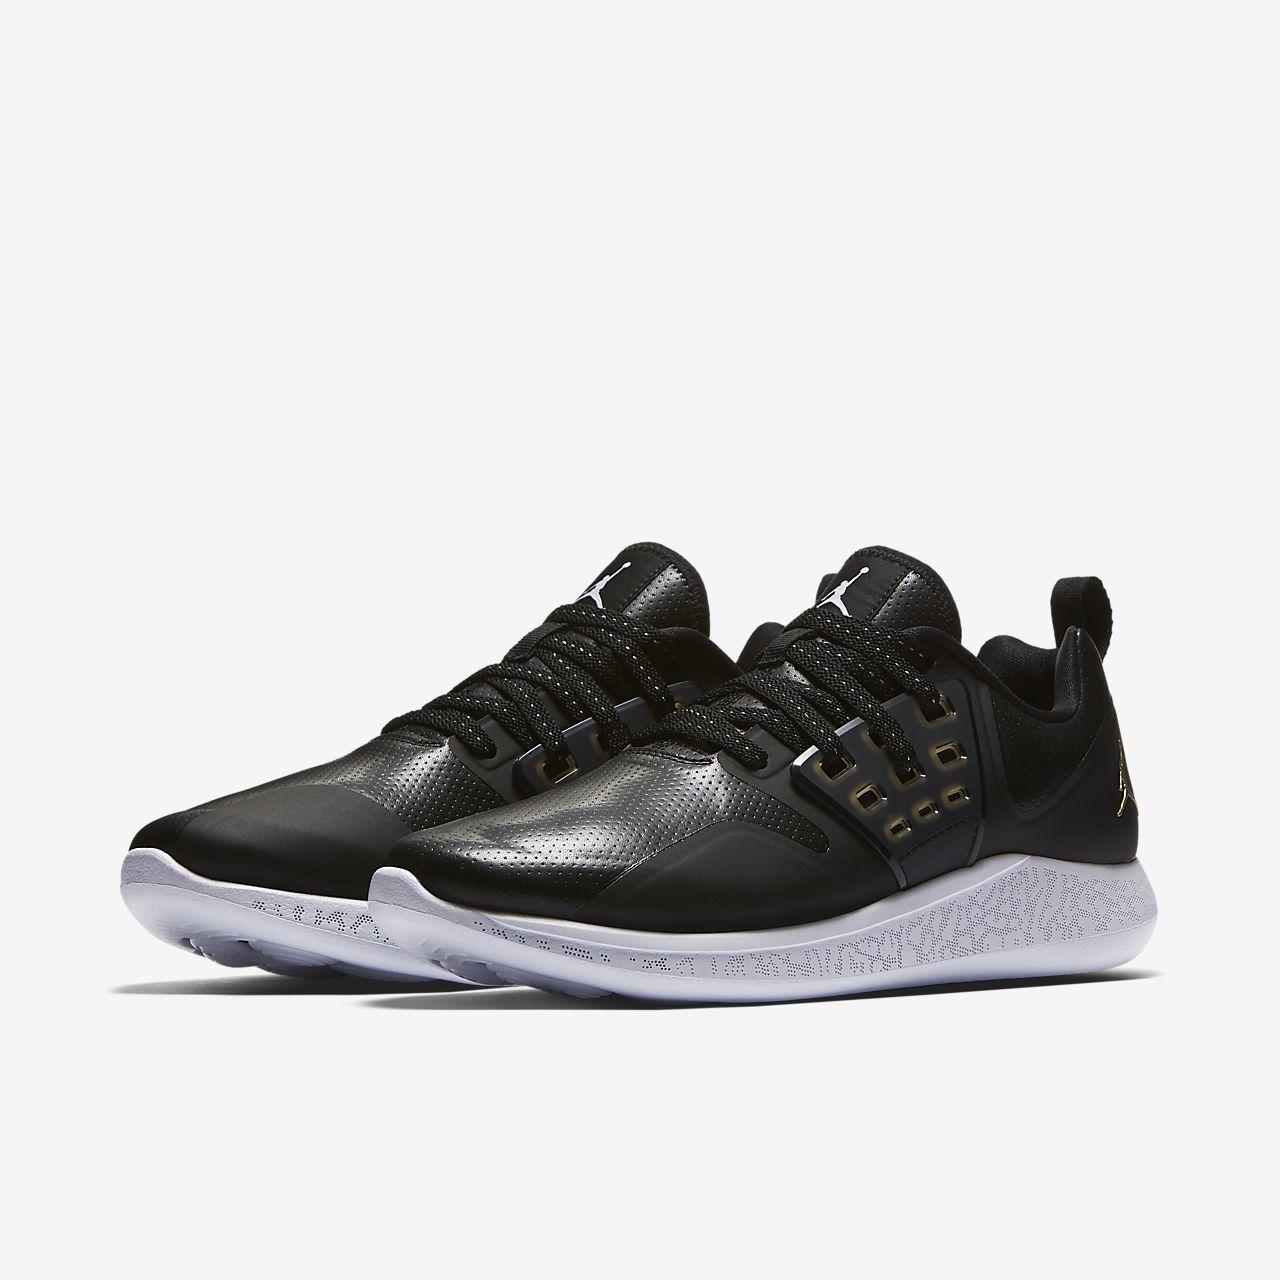 f5d4ab3fead12a Jordan Grind Men s Running Shoe. Nike.com IN